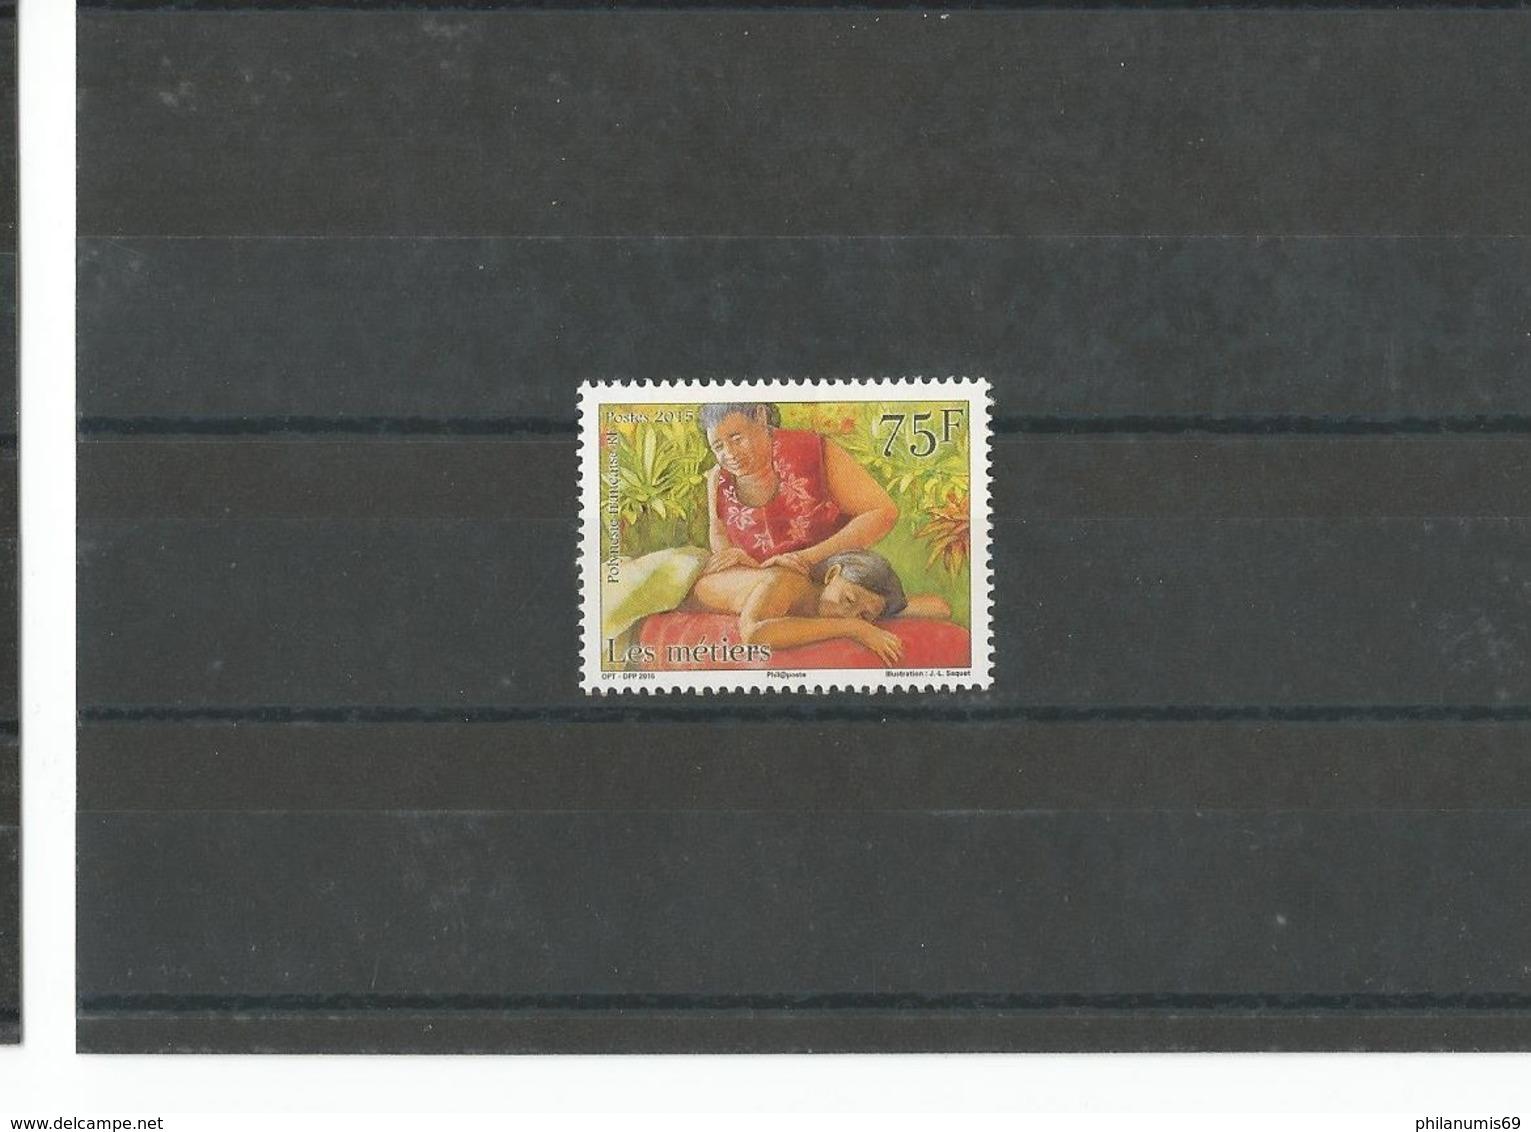 POLYNESIE 2015 - YT 1081 - NEUF SANS CHARNIERE ** (MNH) GOMME D'ORIGINE LUXE - Polynésie Française